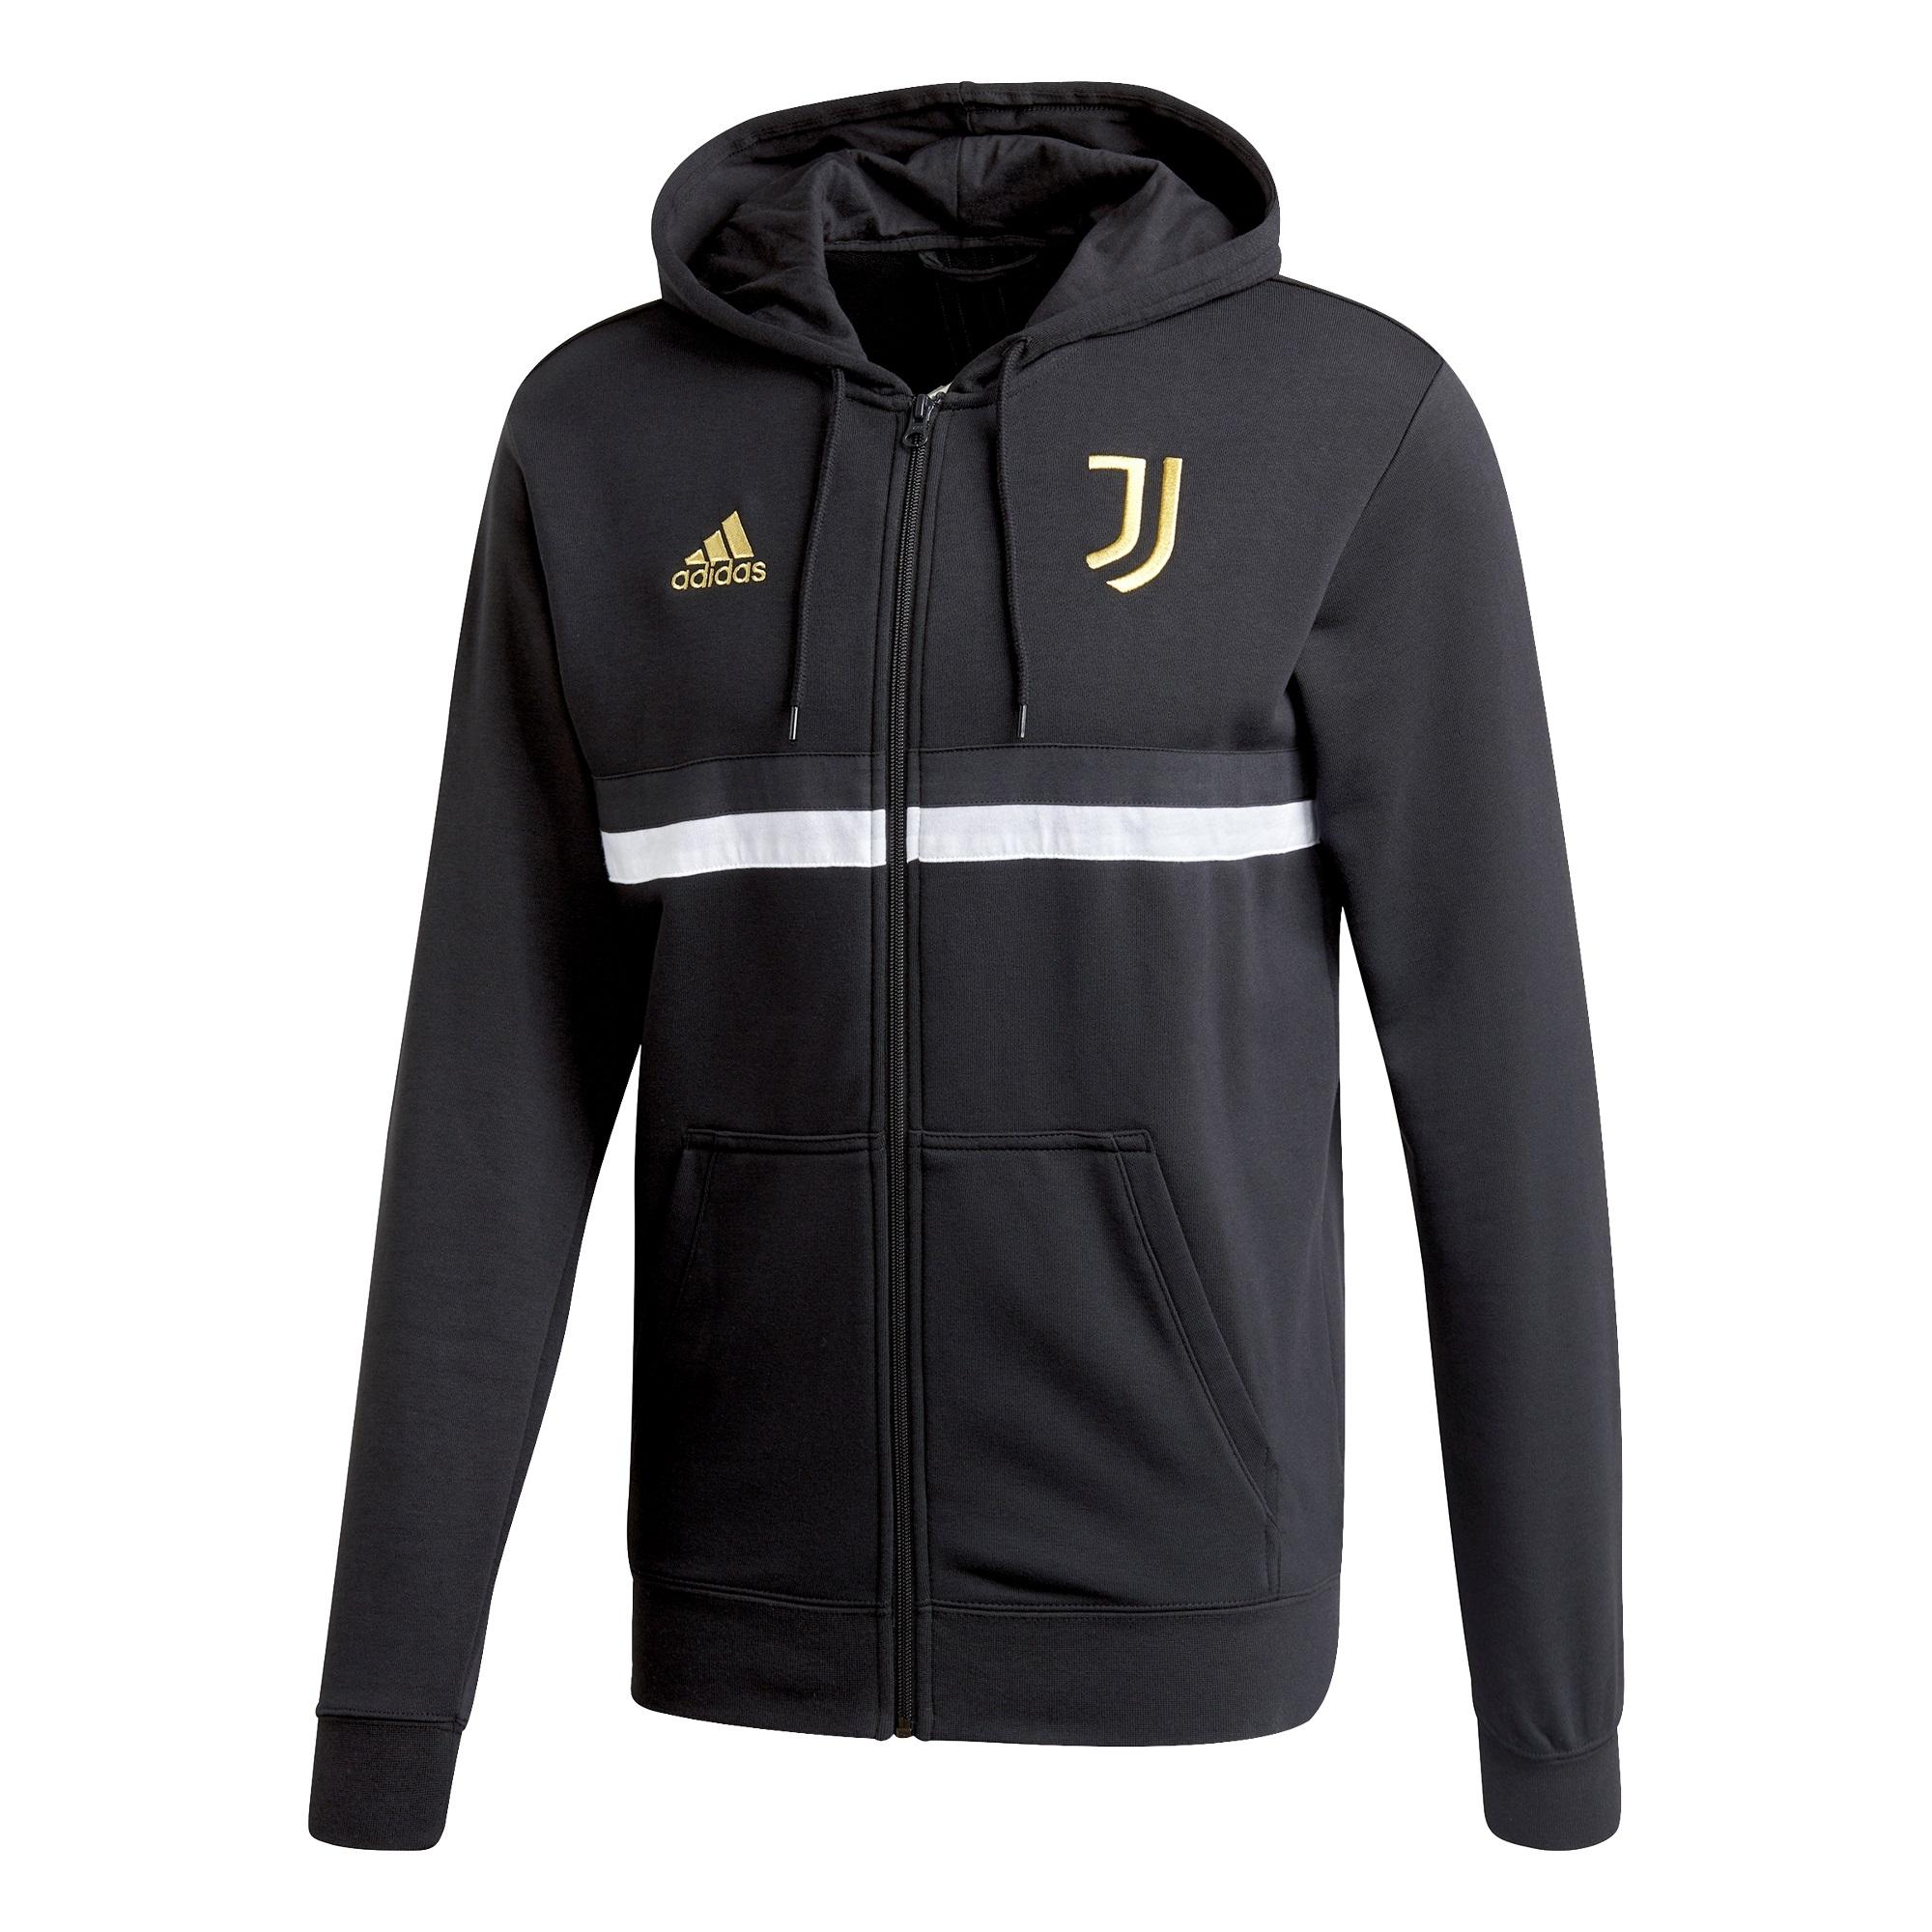 JUVENTUS FELPA CAPPUCCIO ZIP NERA 2020-21 | CalcioItalia.com